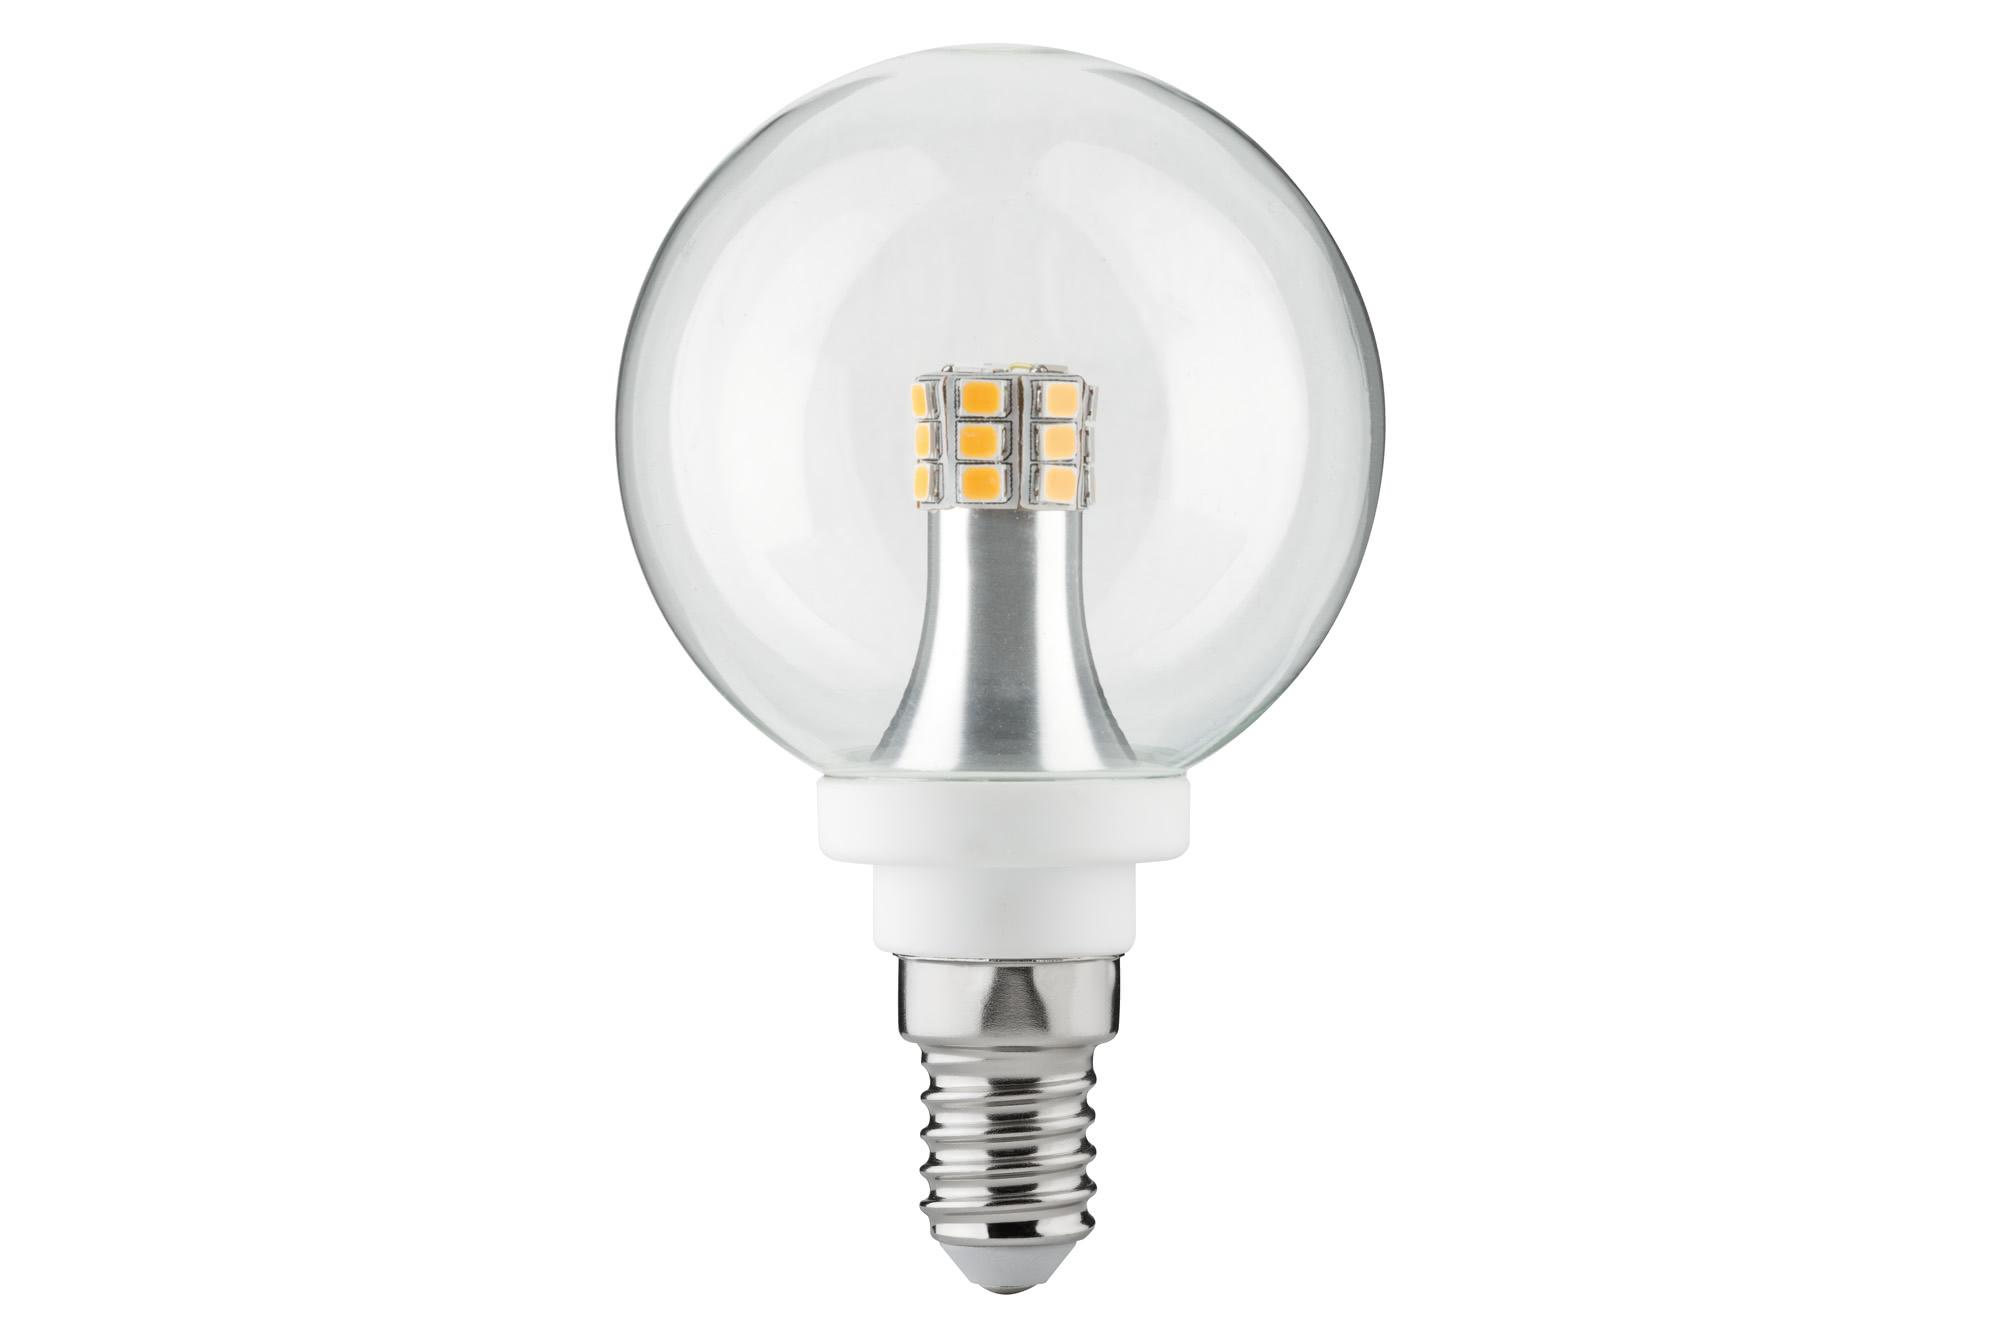 Paulmann. 28319 LED Globe 60 4W E14 Klar 2700K